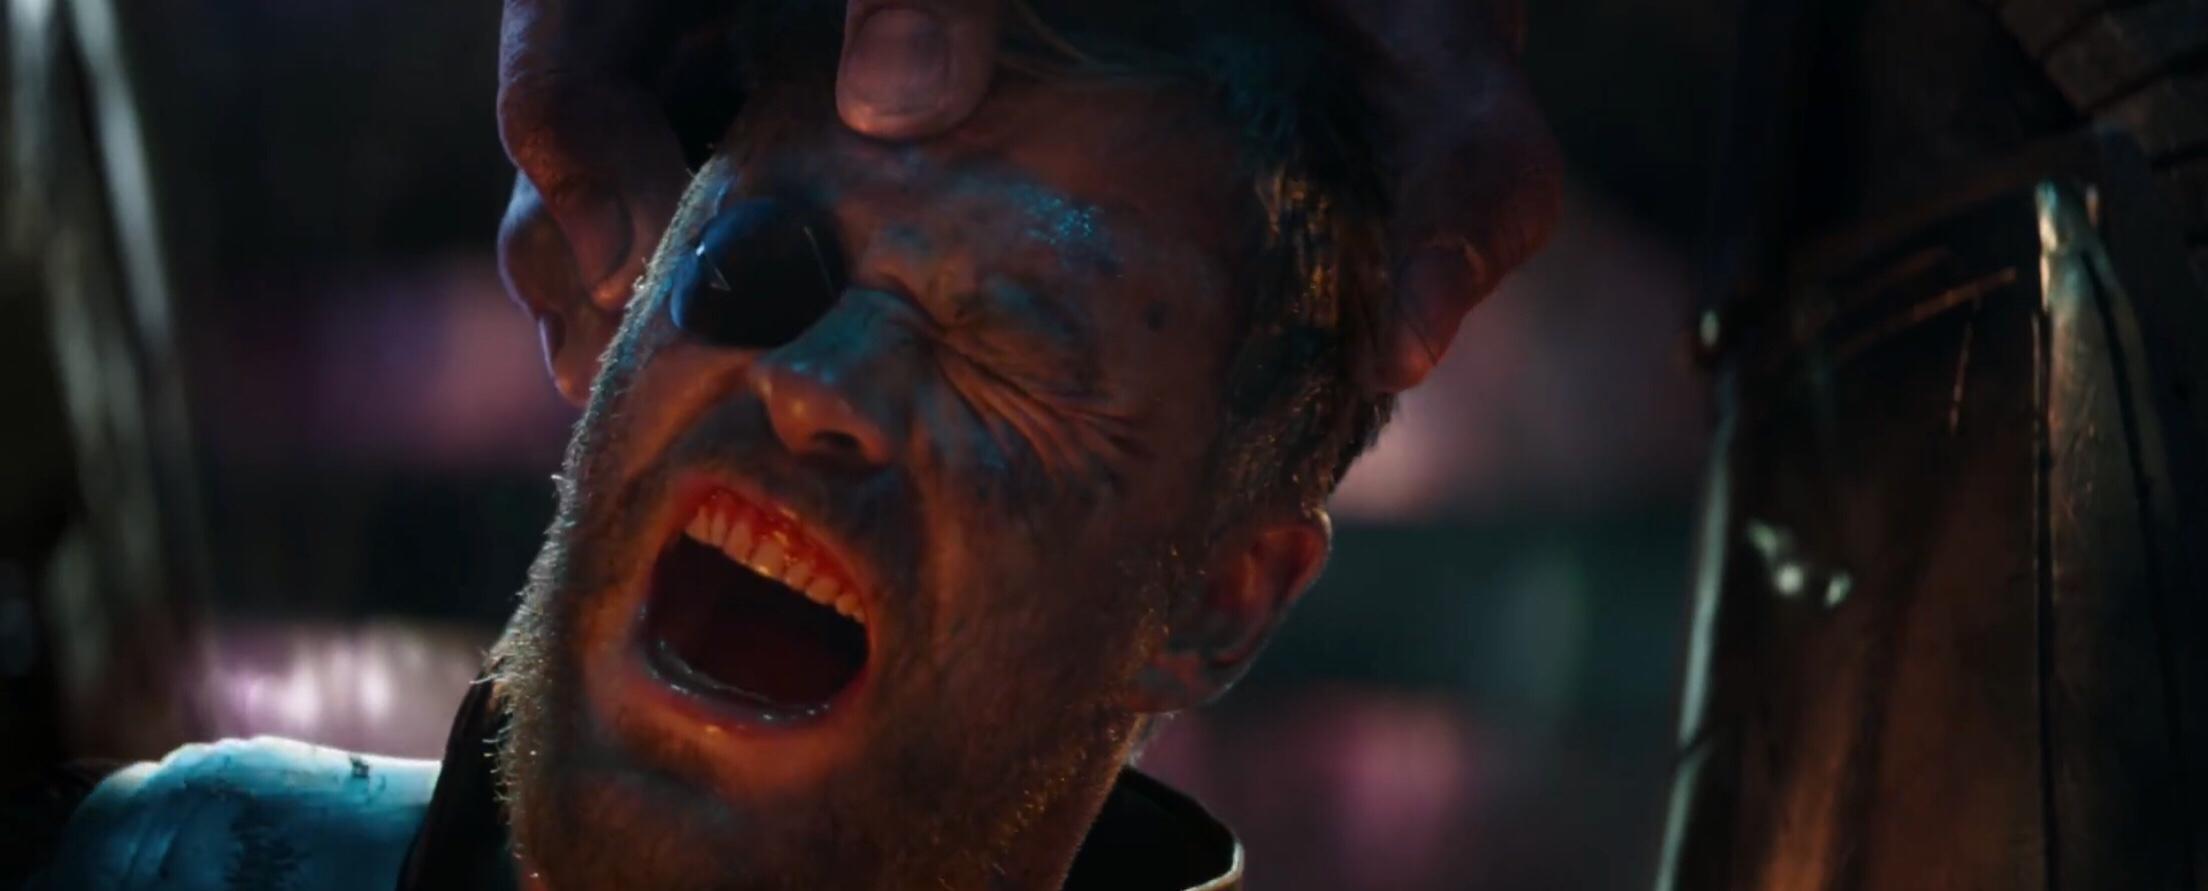 thor dies in avengers infinity war